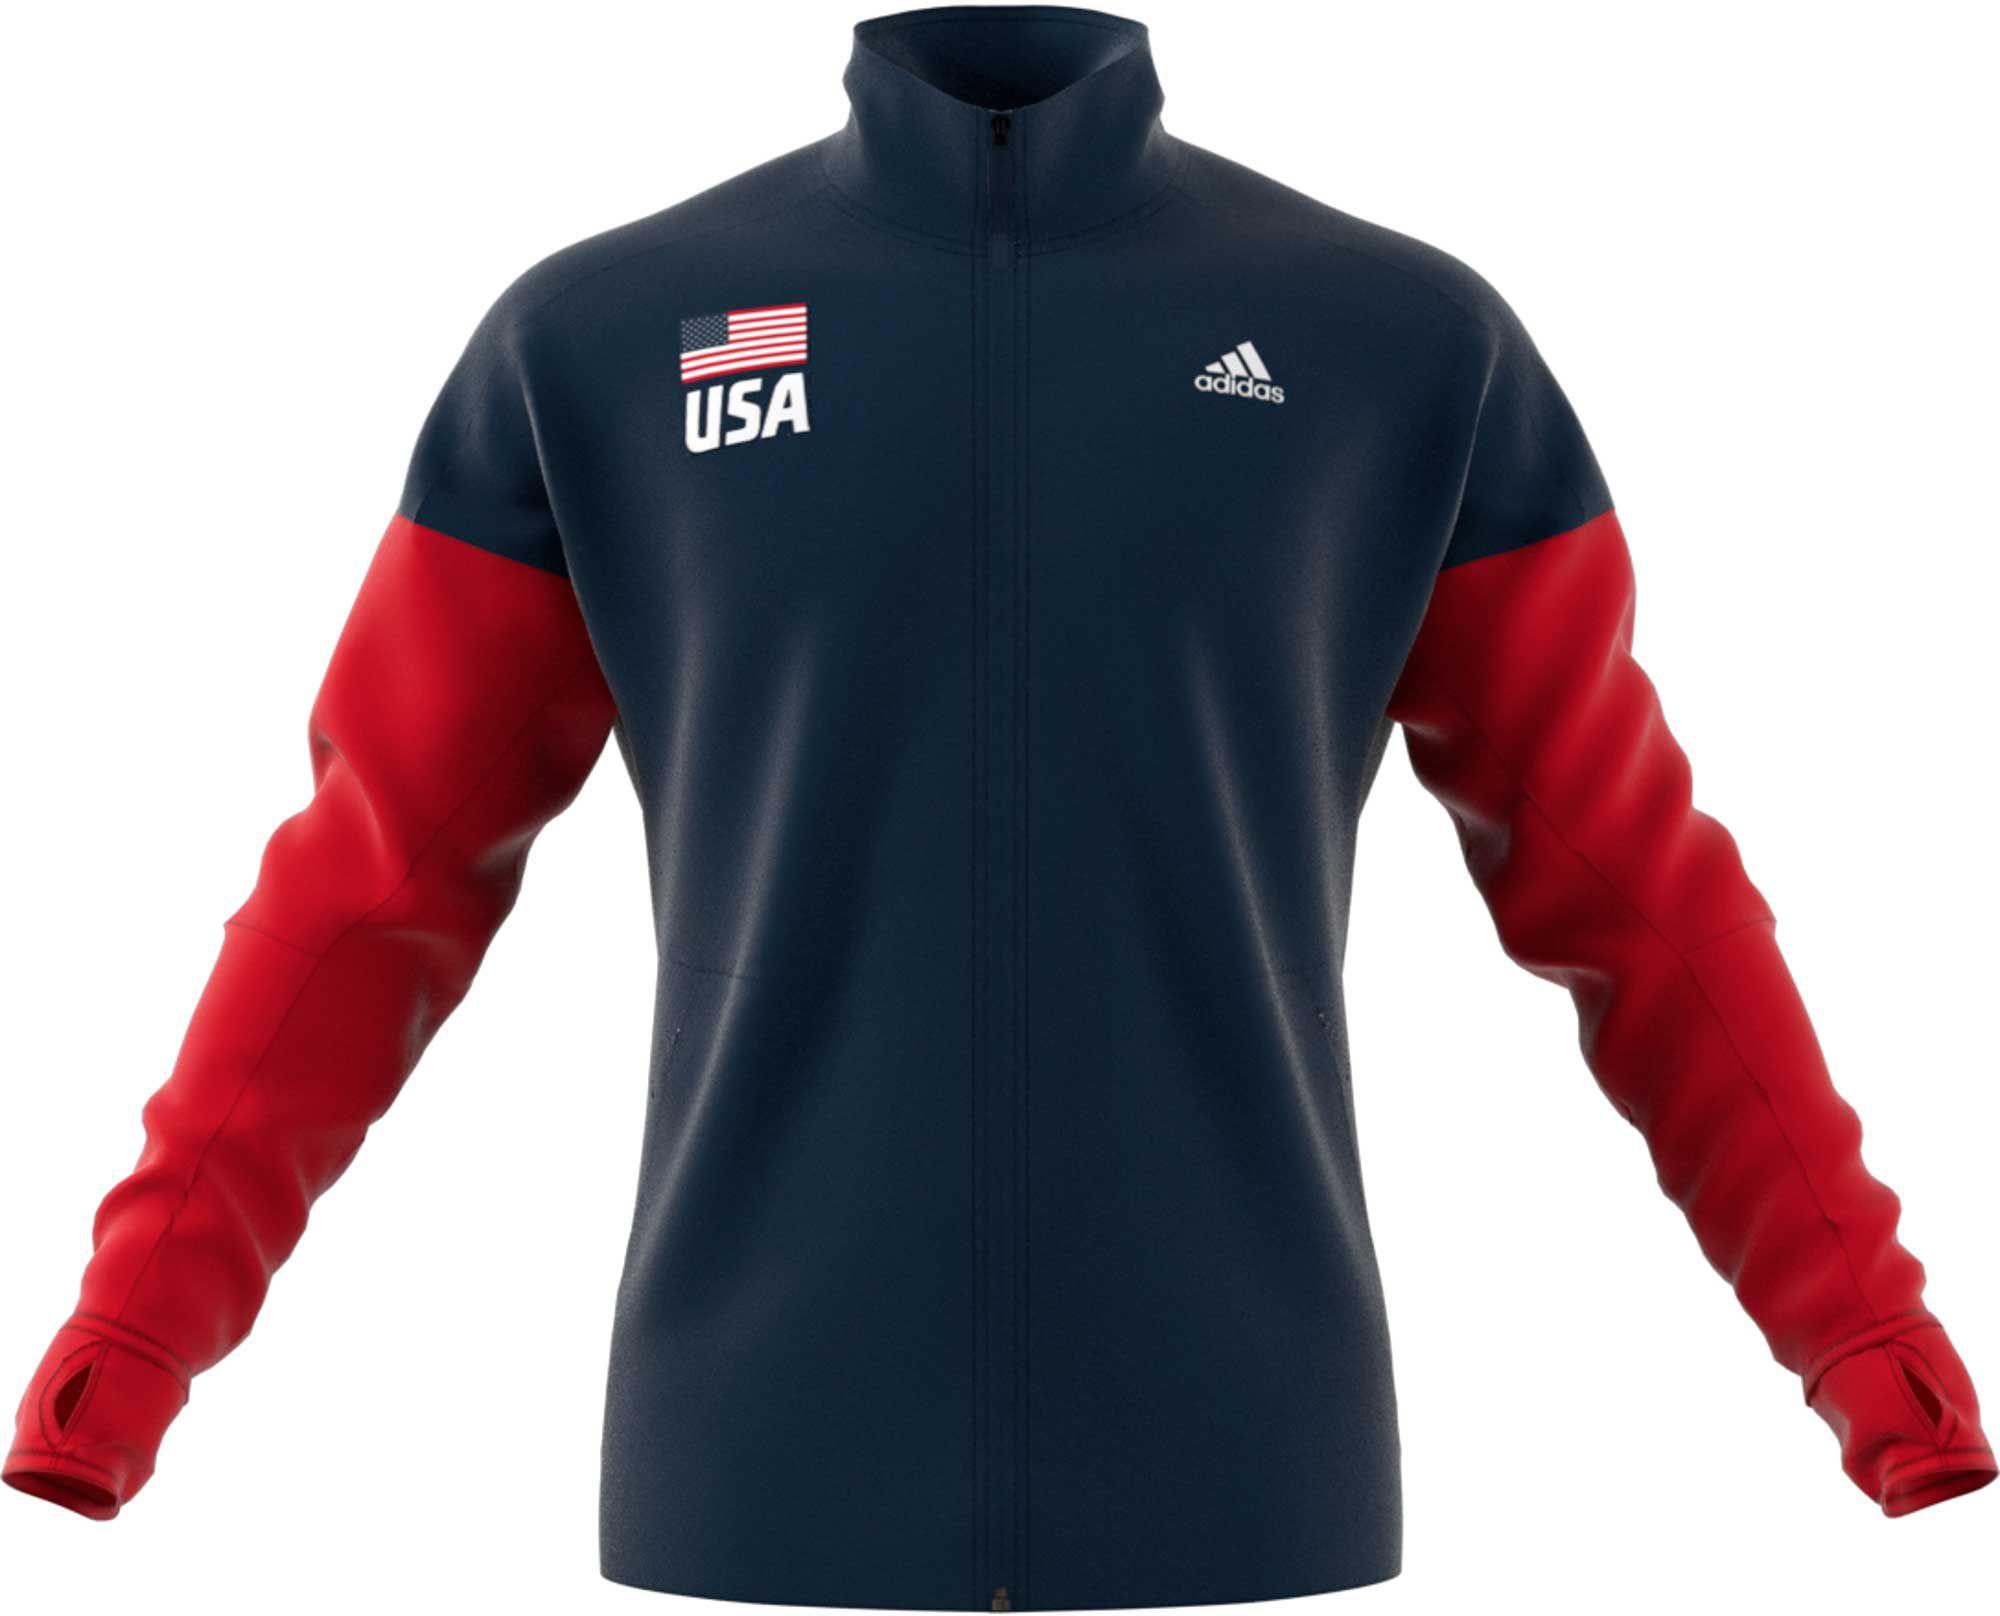 adidas Men's USA Volleyball Full Zip Warmup Jacket